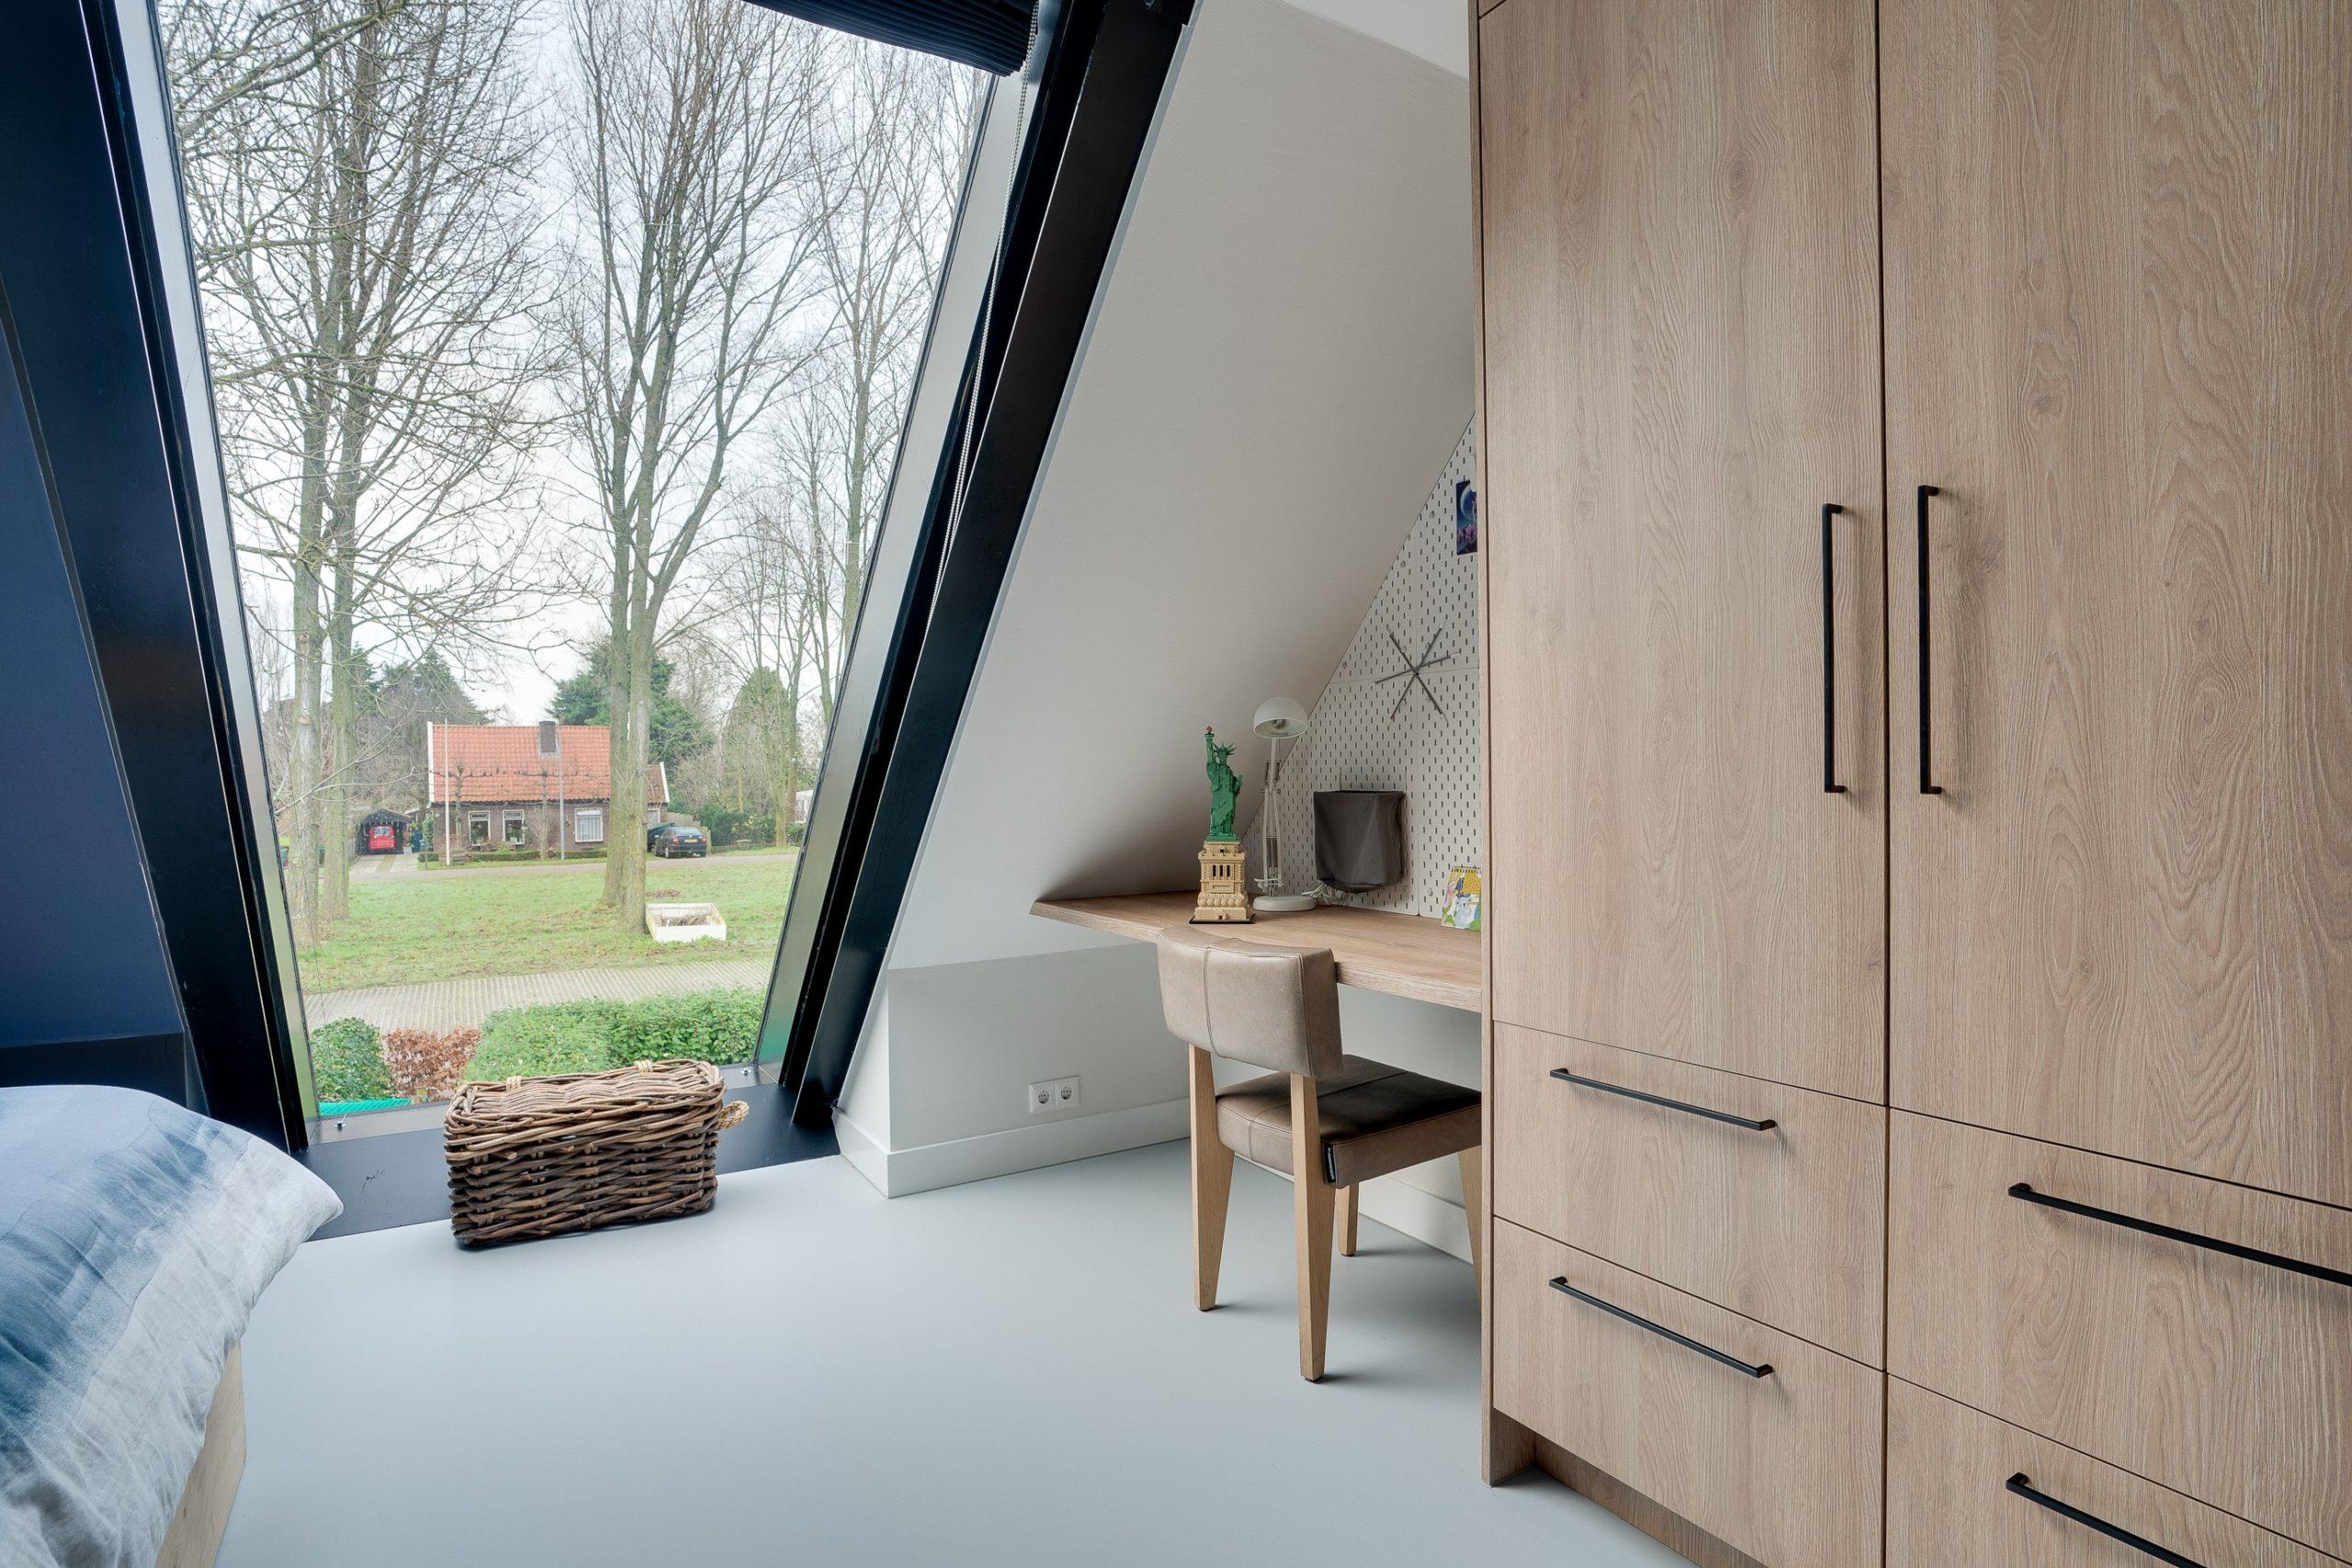 S128 Pembroke - Pronk Keukens & Interieurs BV - ByWalters